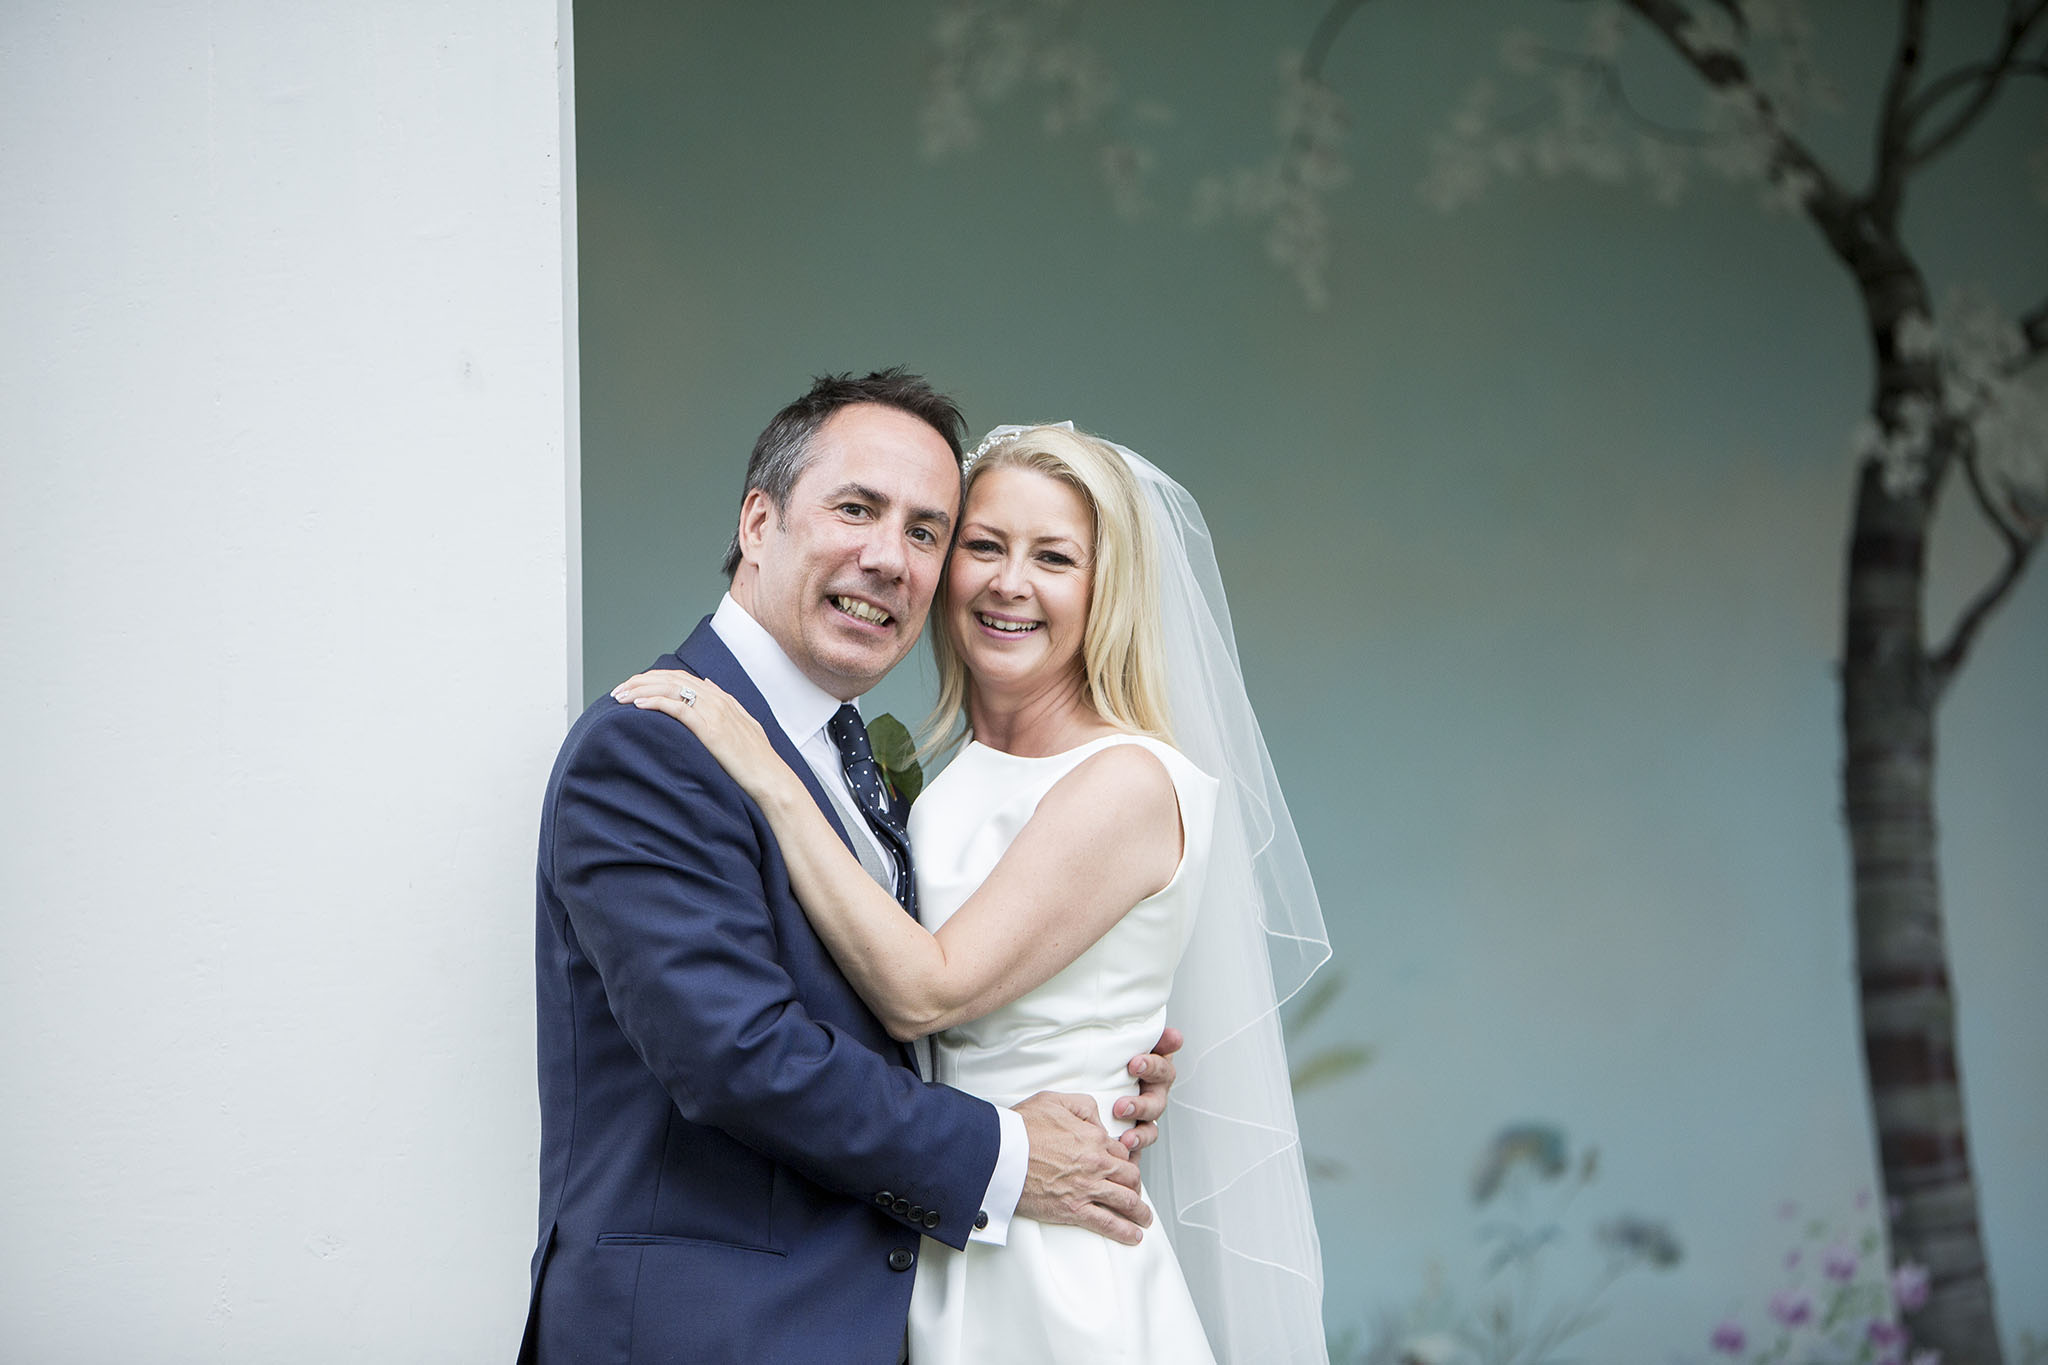 elizabethg_photography_hertfordshire_fineart_photographer_tonycharlie_wedding_photography_aldermaston_wasing_park_reading_36.jpg